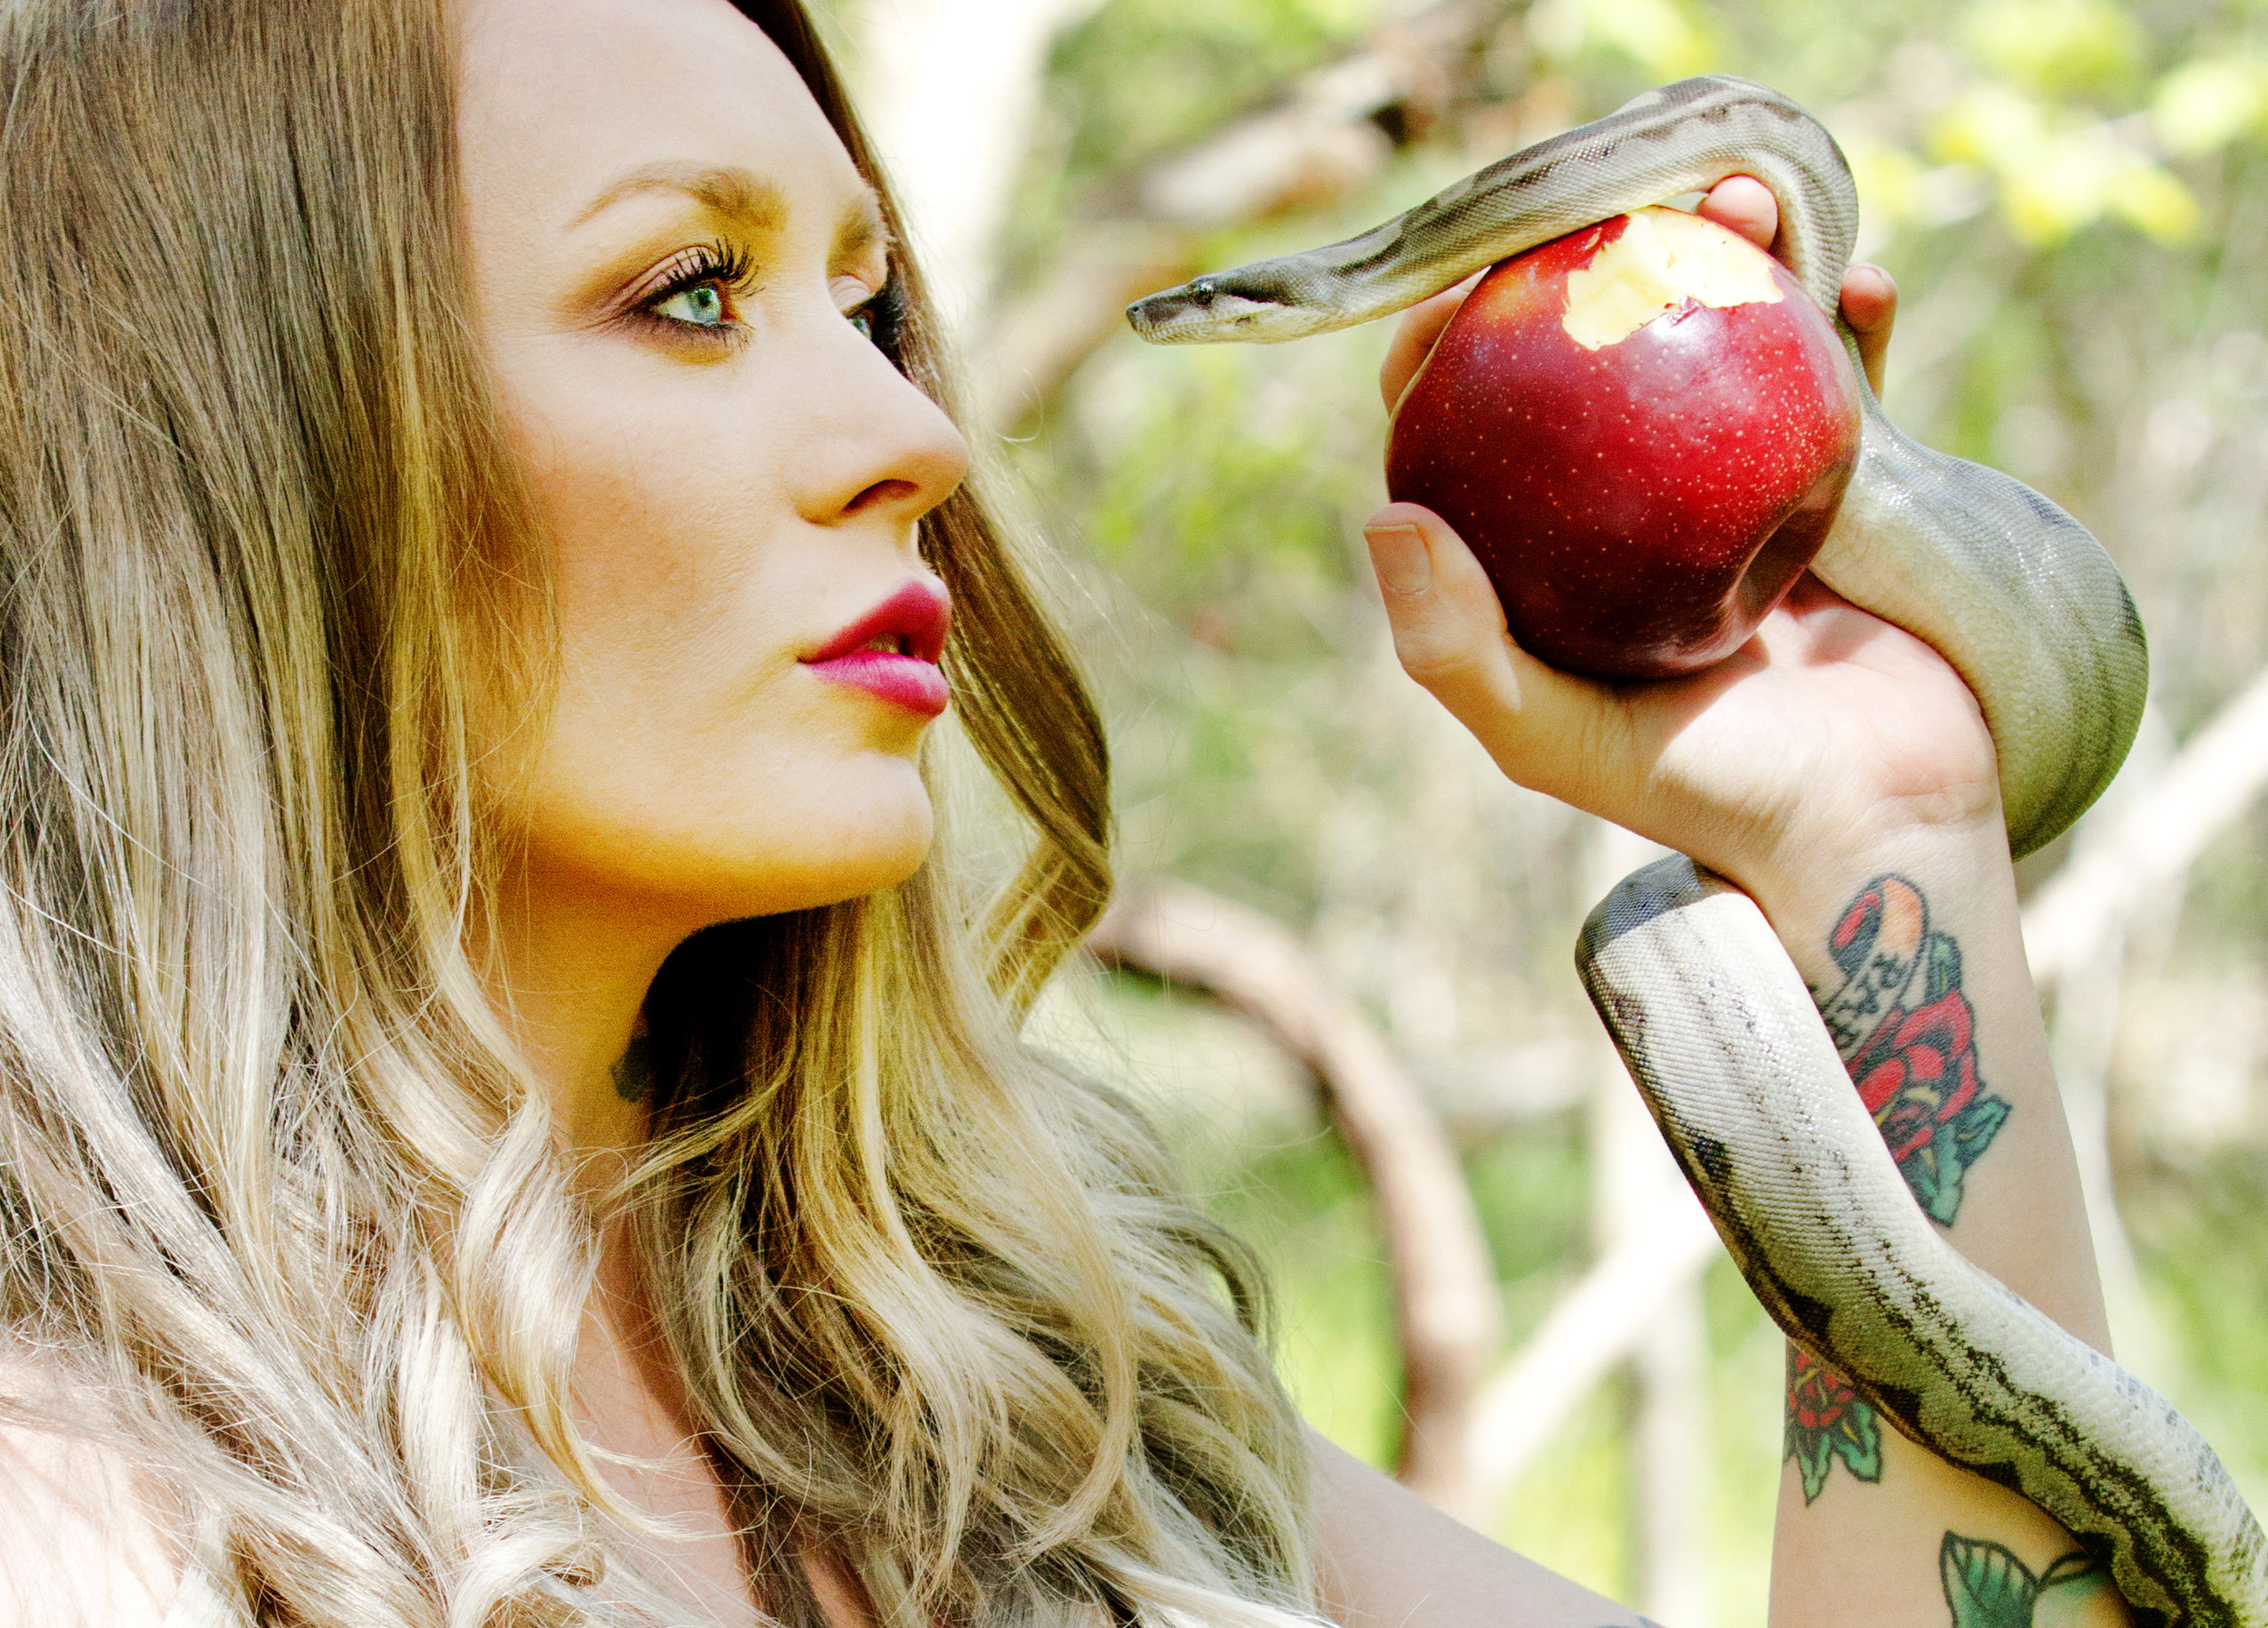 Adam's Apple by Kimberly Kraut